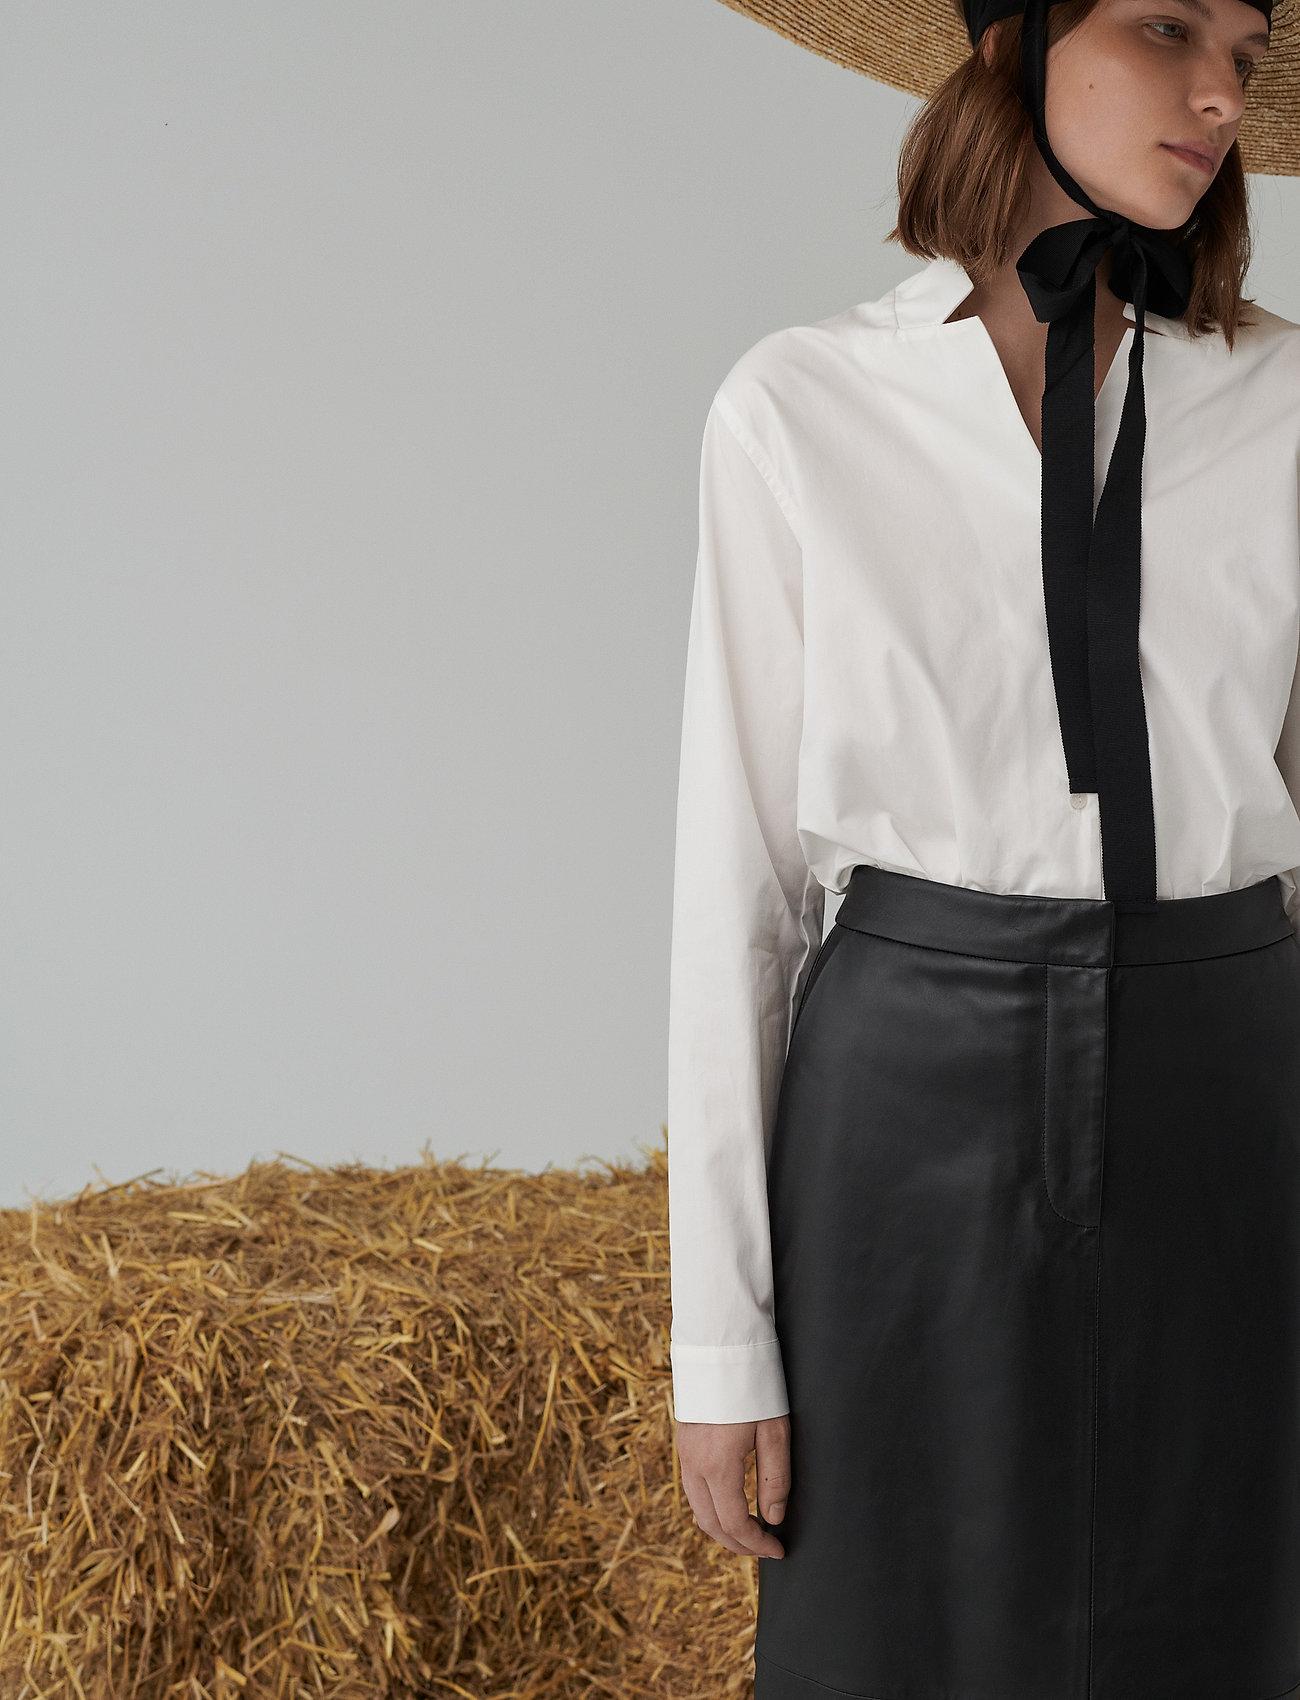 2NDDAY - 2ND Beth ThinkTwice - blouses med lange mouwen - white - 0